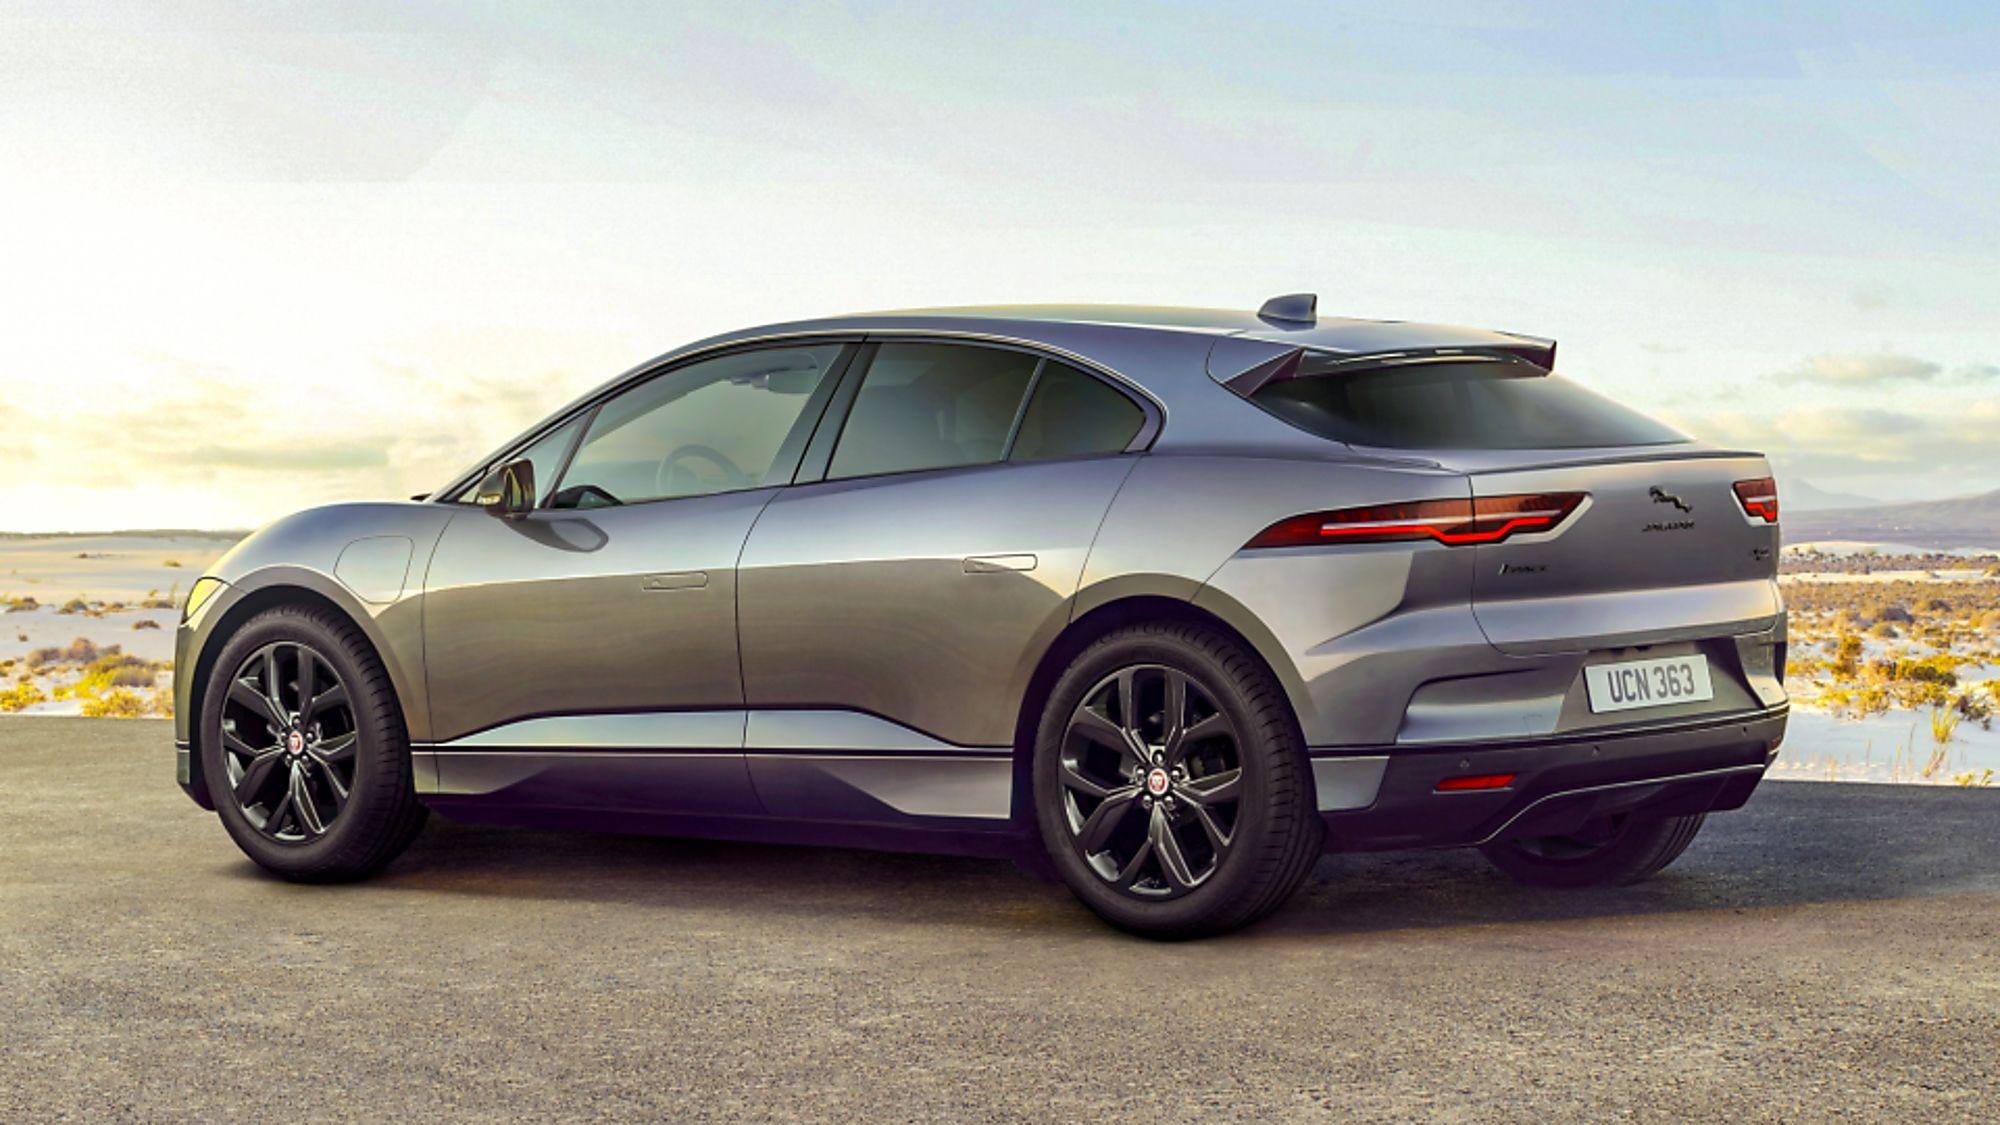 JAGUAR: All-electric I-Pace gets two new 'Black' models